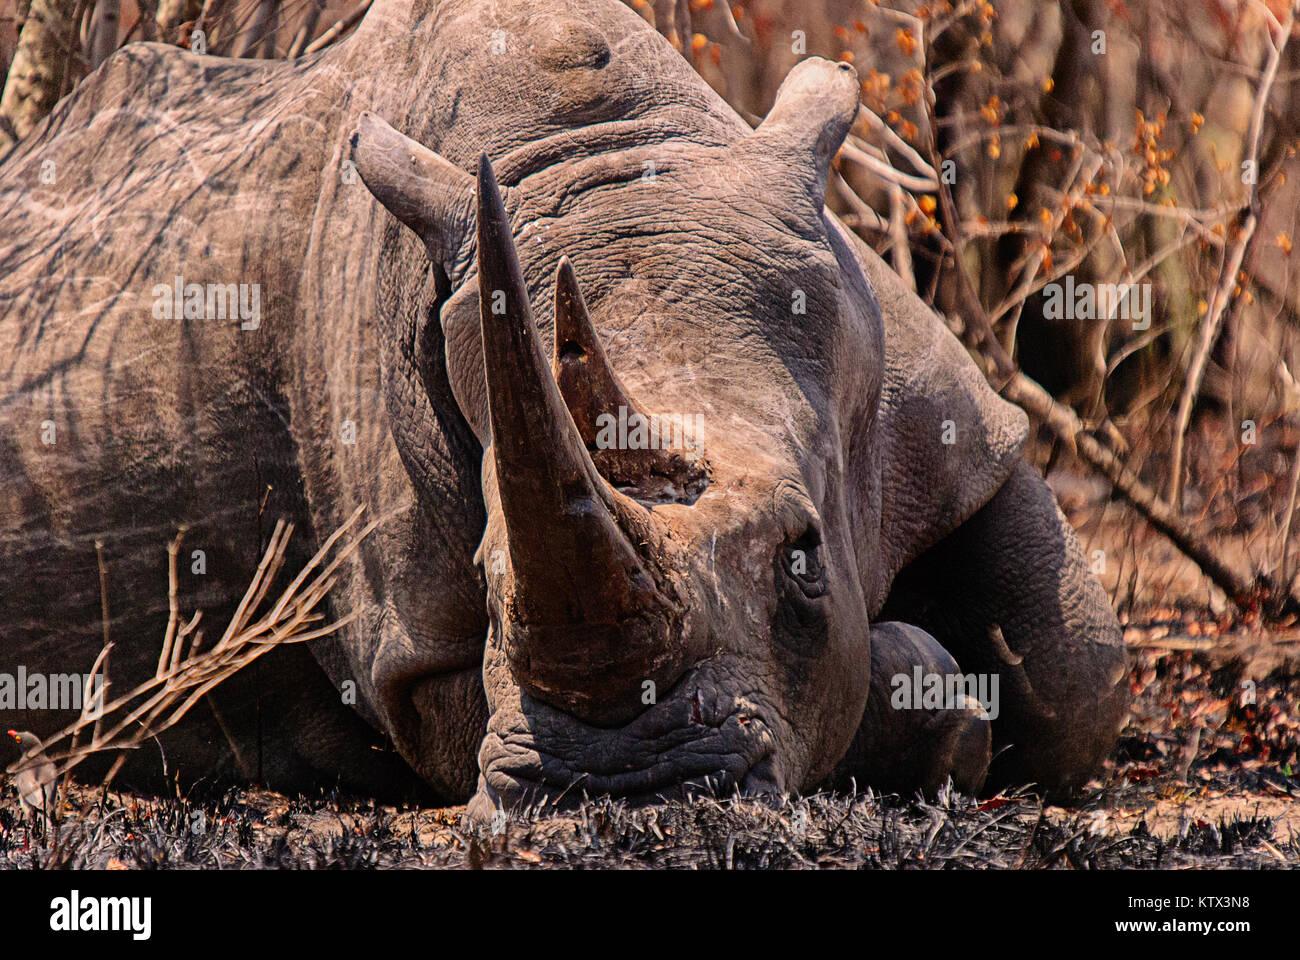 White rhinocerous - Stock Image